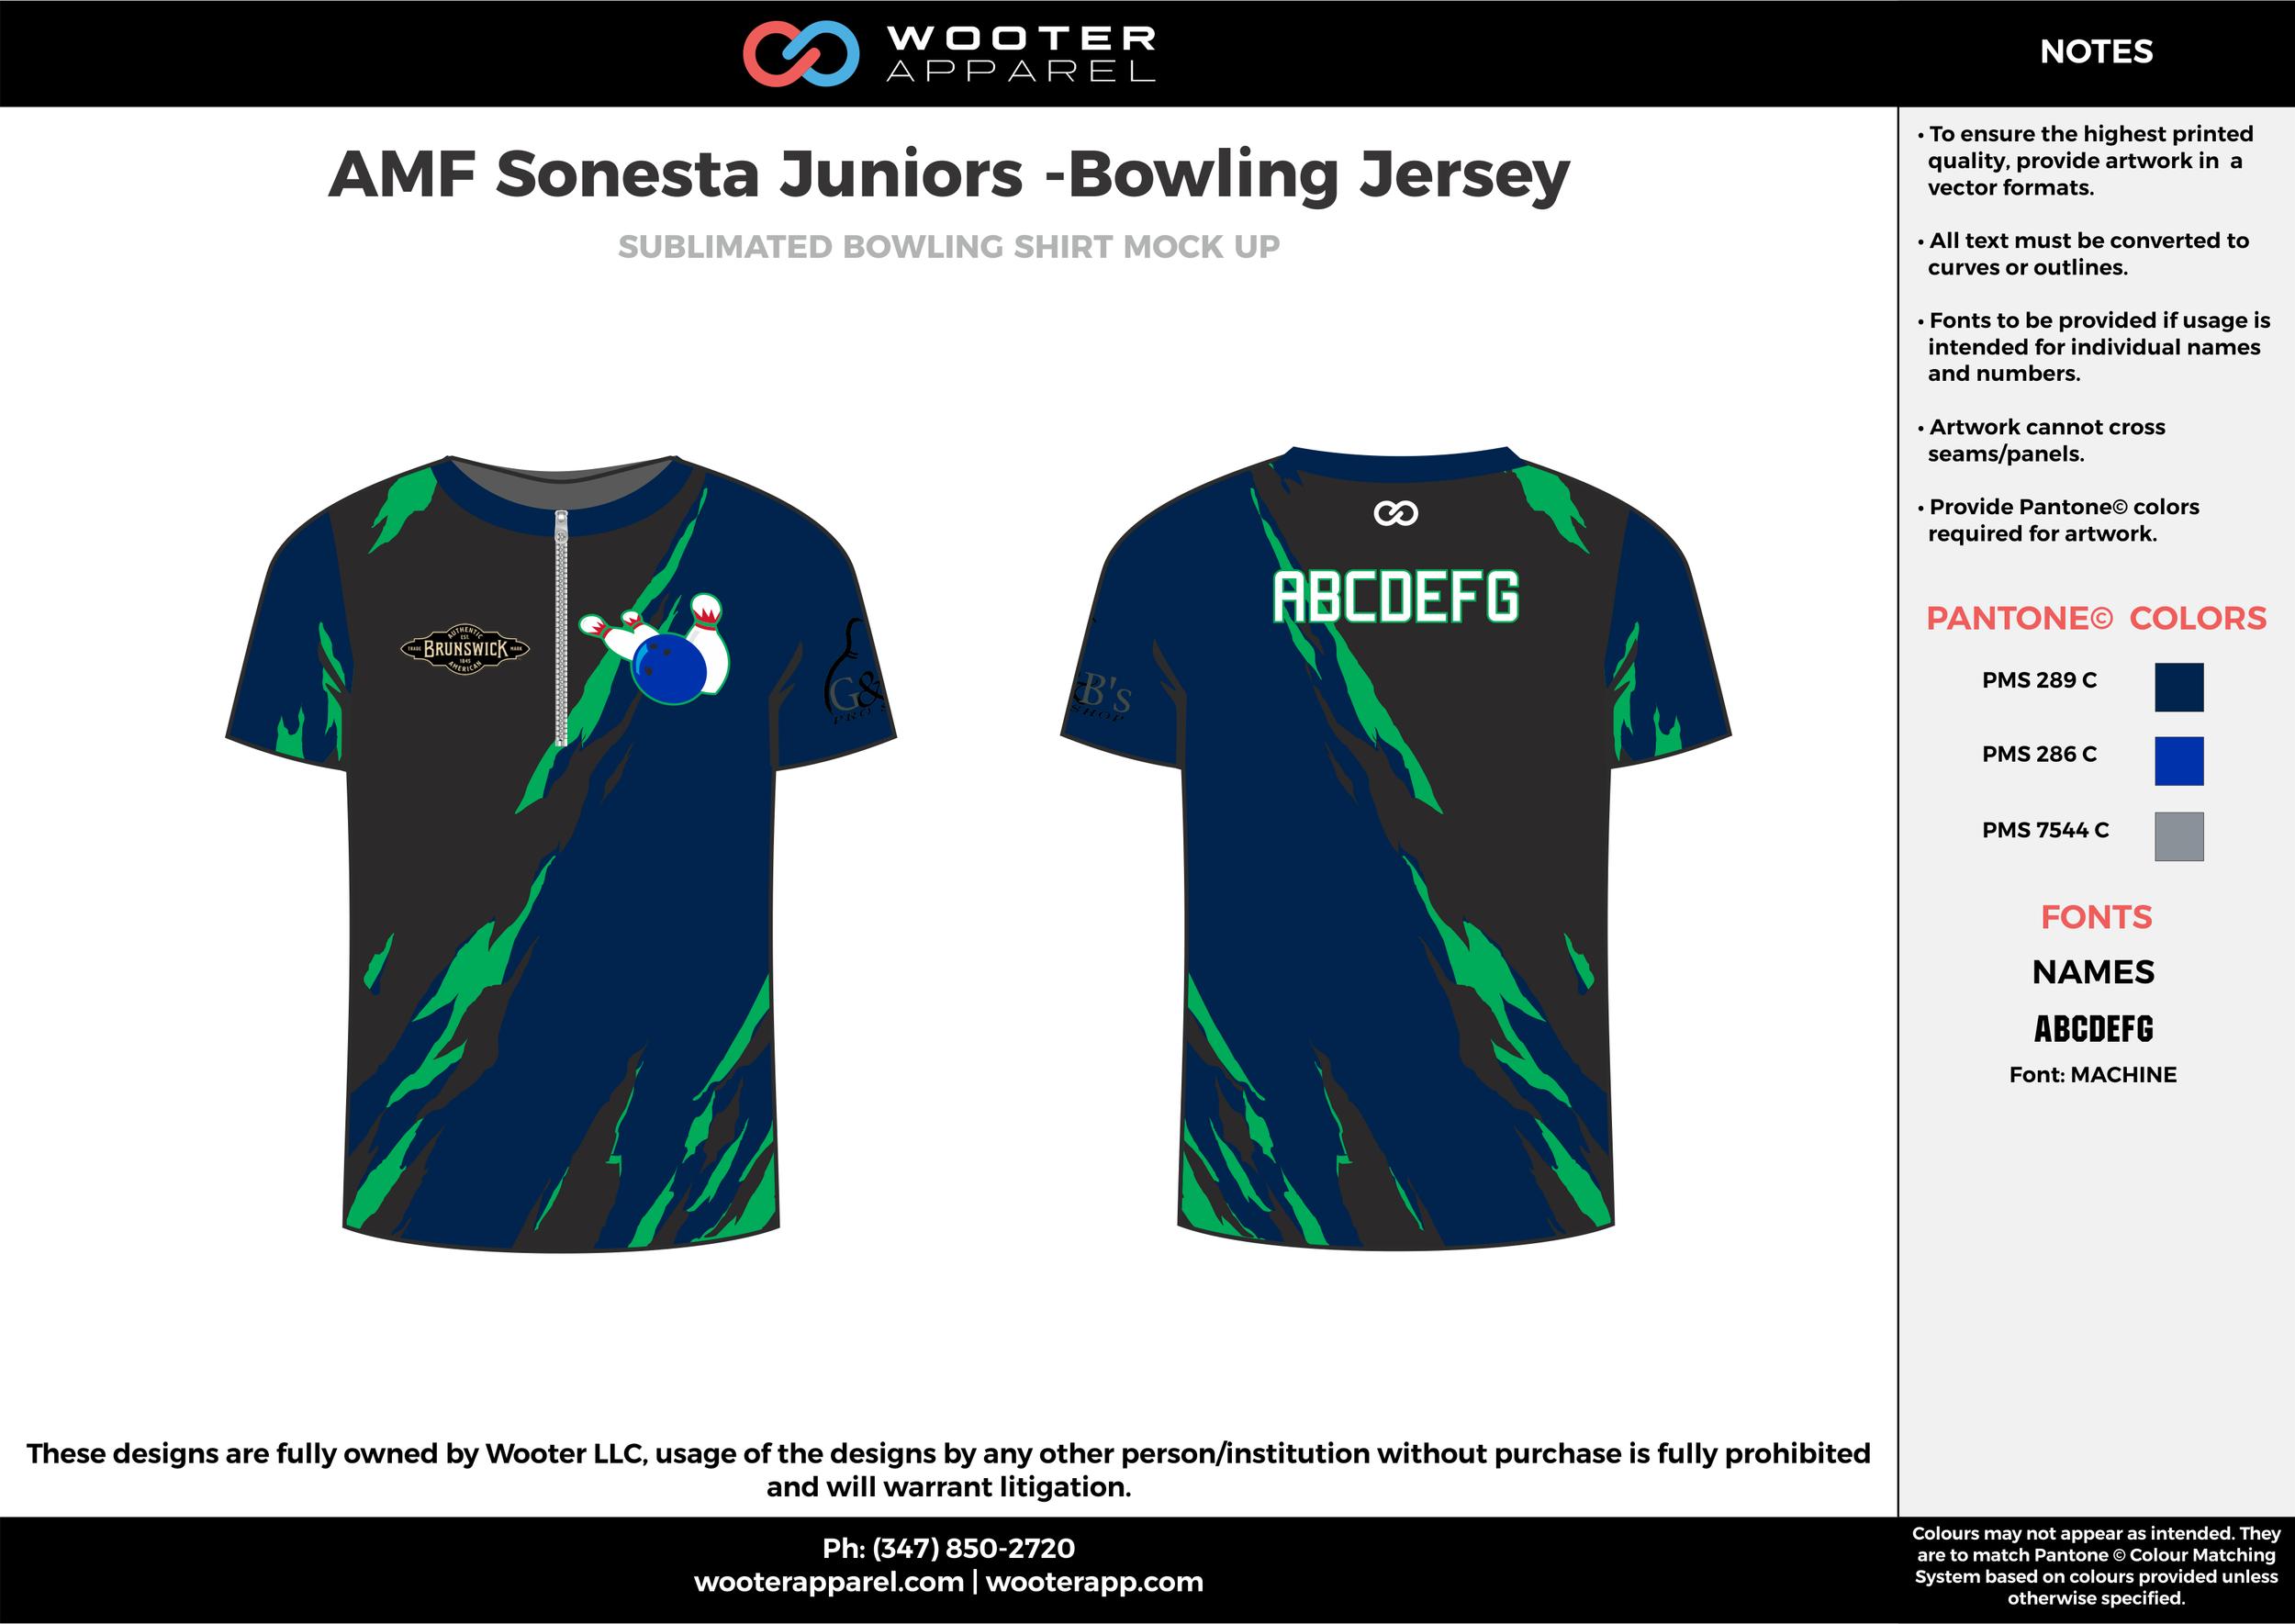 AMF Sonesta Juniors blue black green bowling uniforms, shirts, quarter zip polo